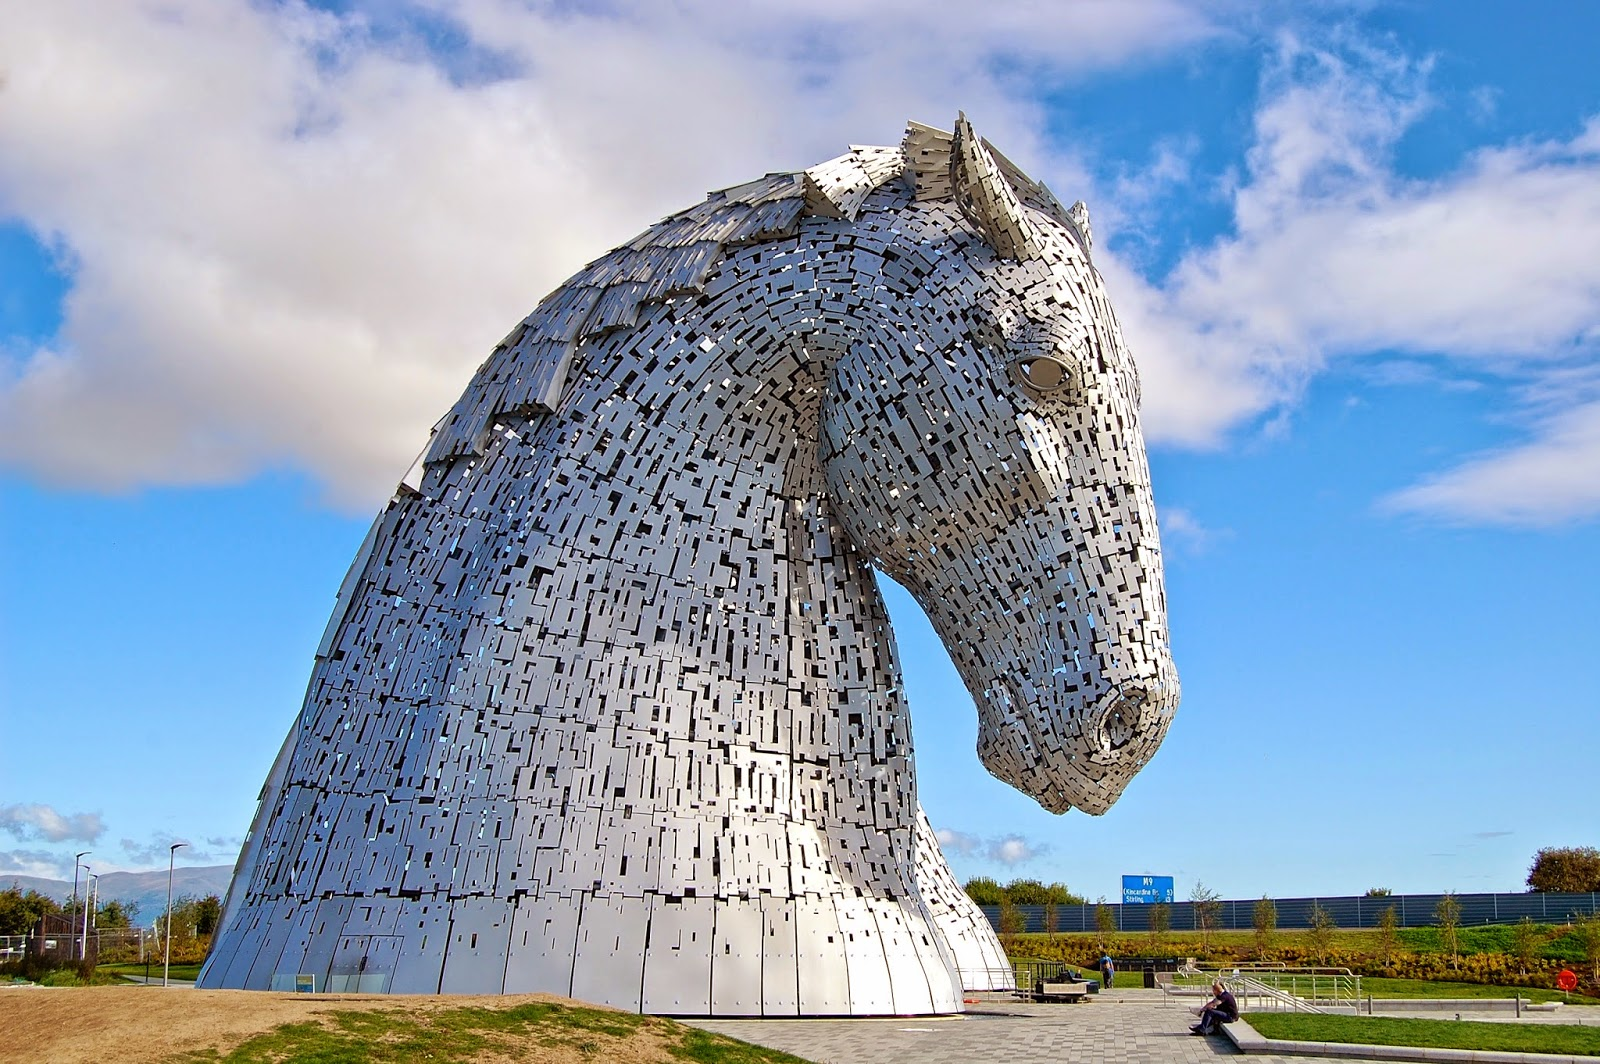 Kelpie with head down, Falkirk, Scotland